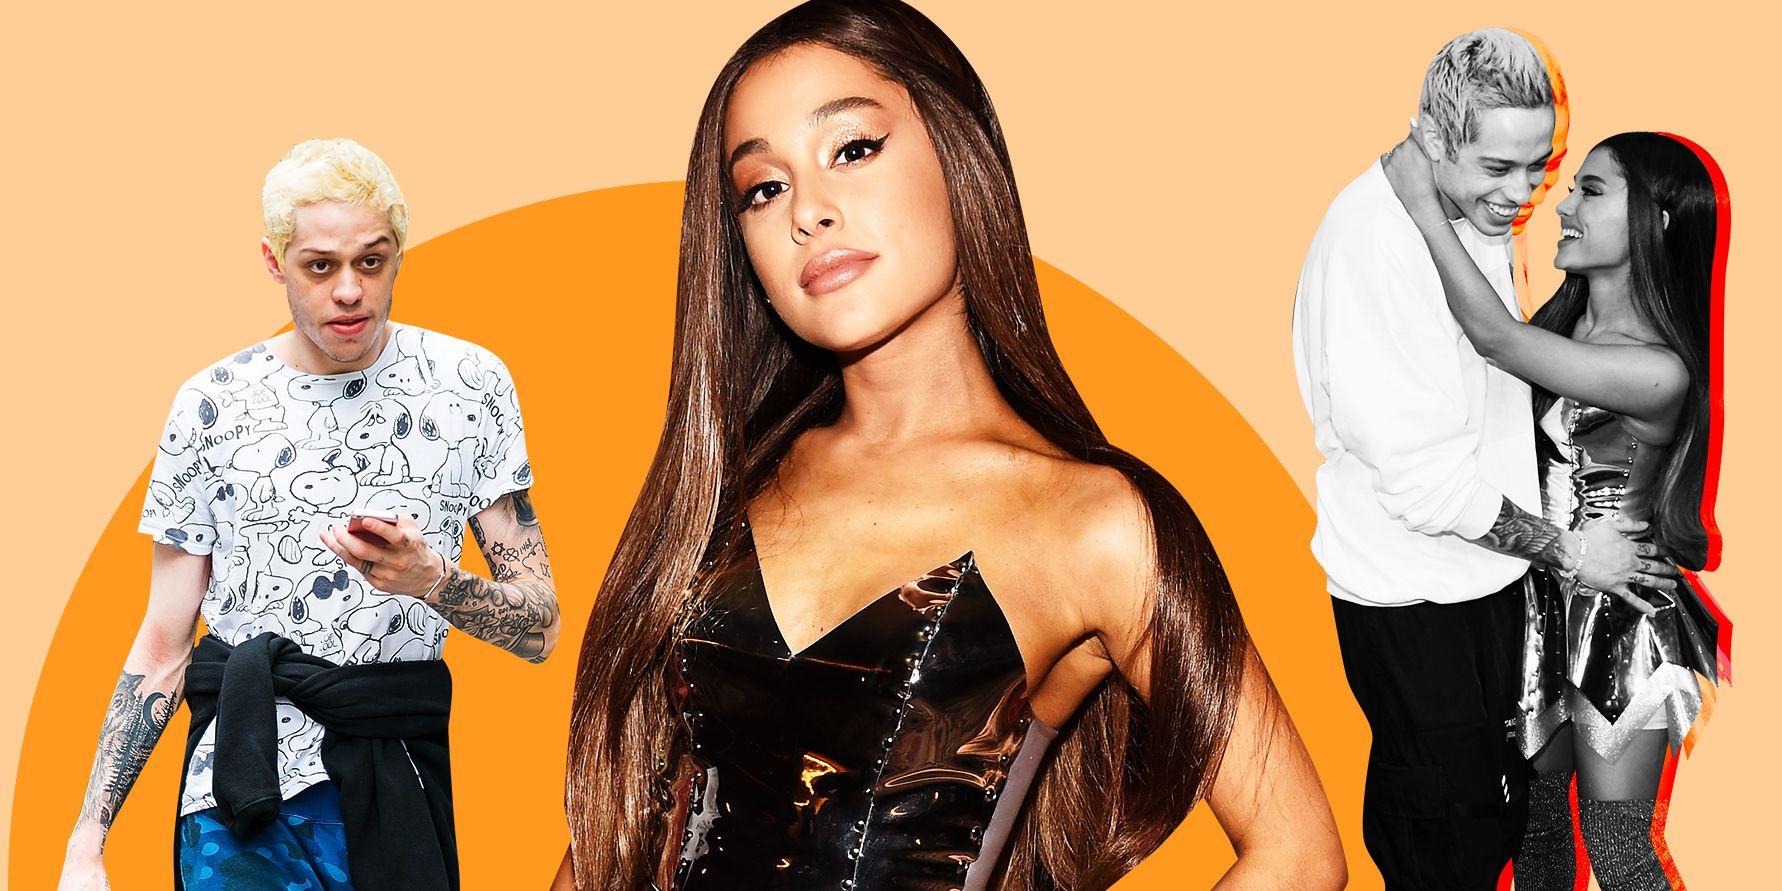 Ariana Grande and Pete Davidson breakup